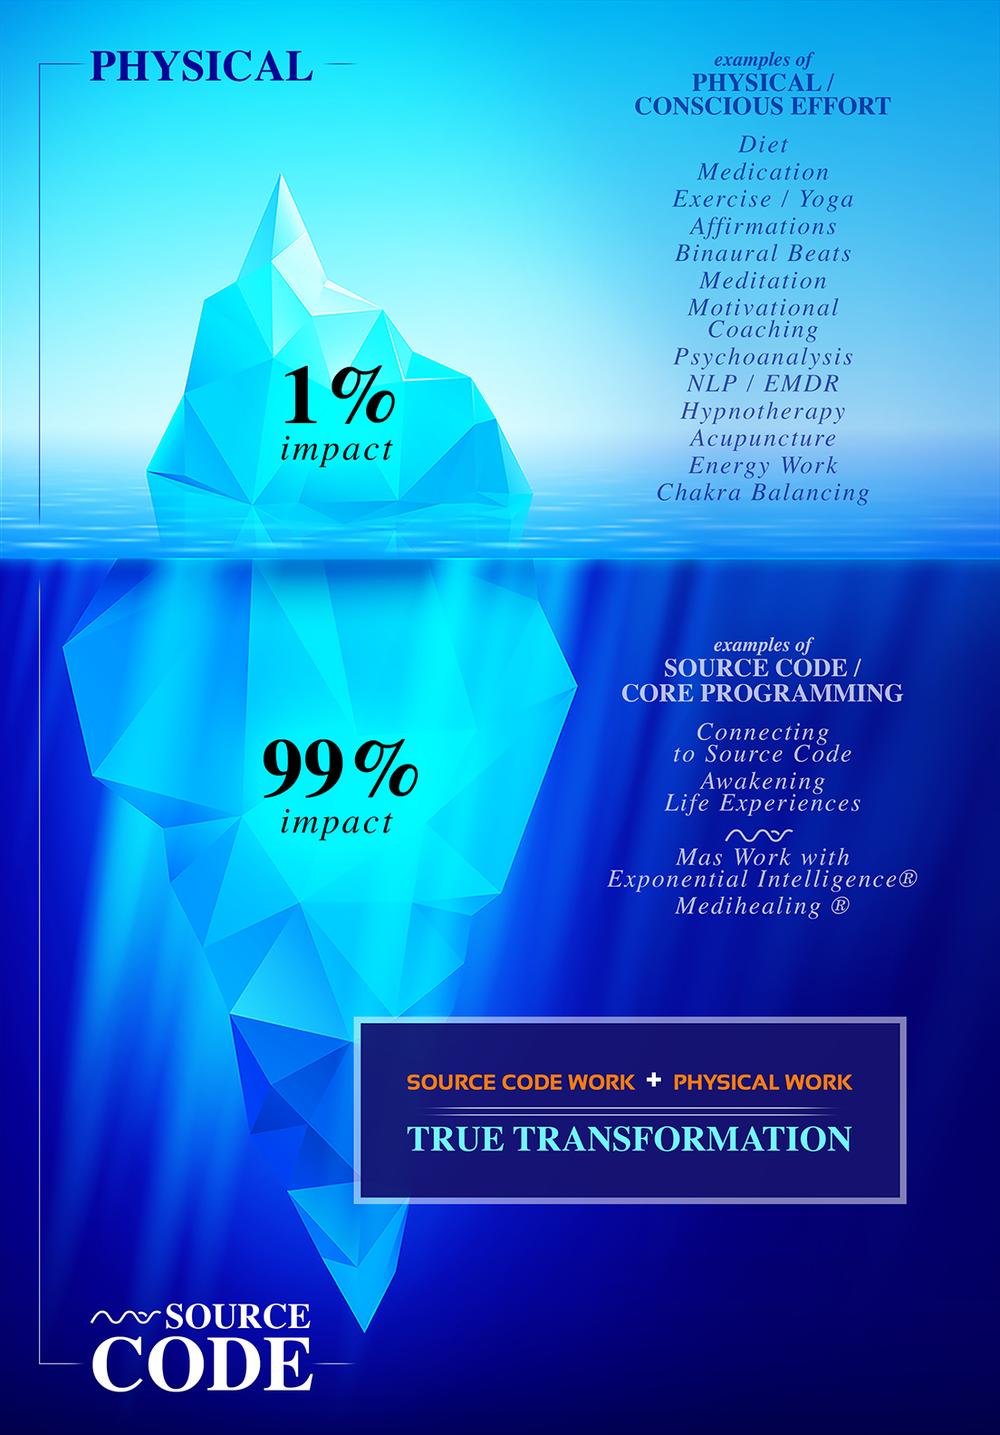 mas-sajady-true-transformation-sm.png